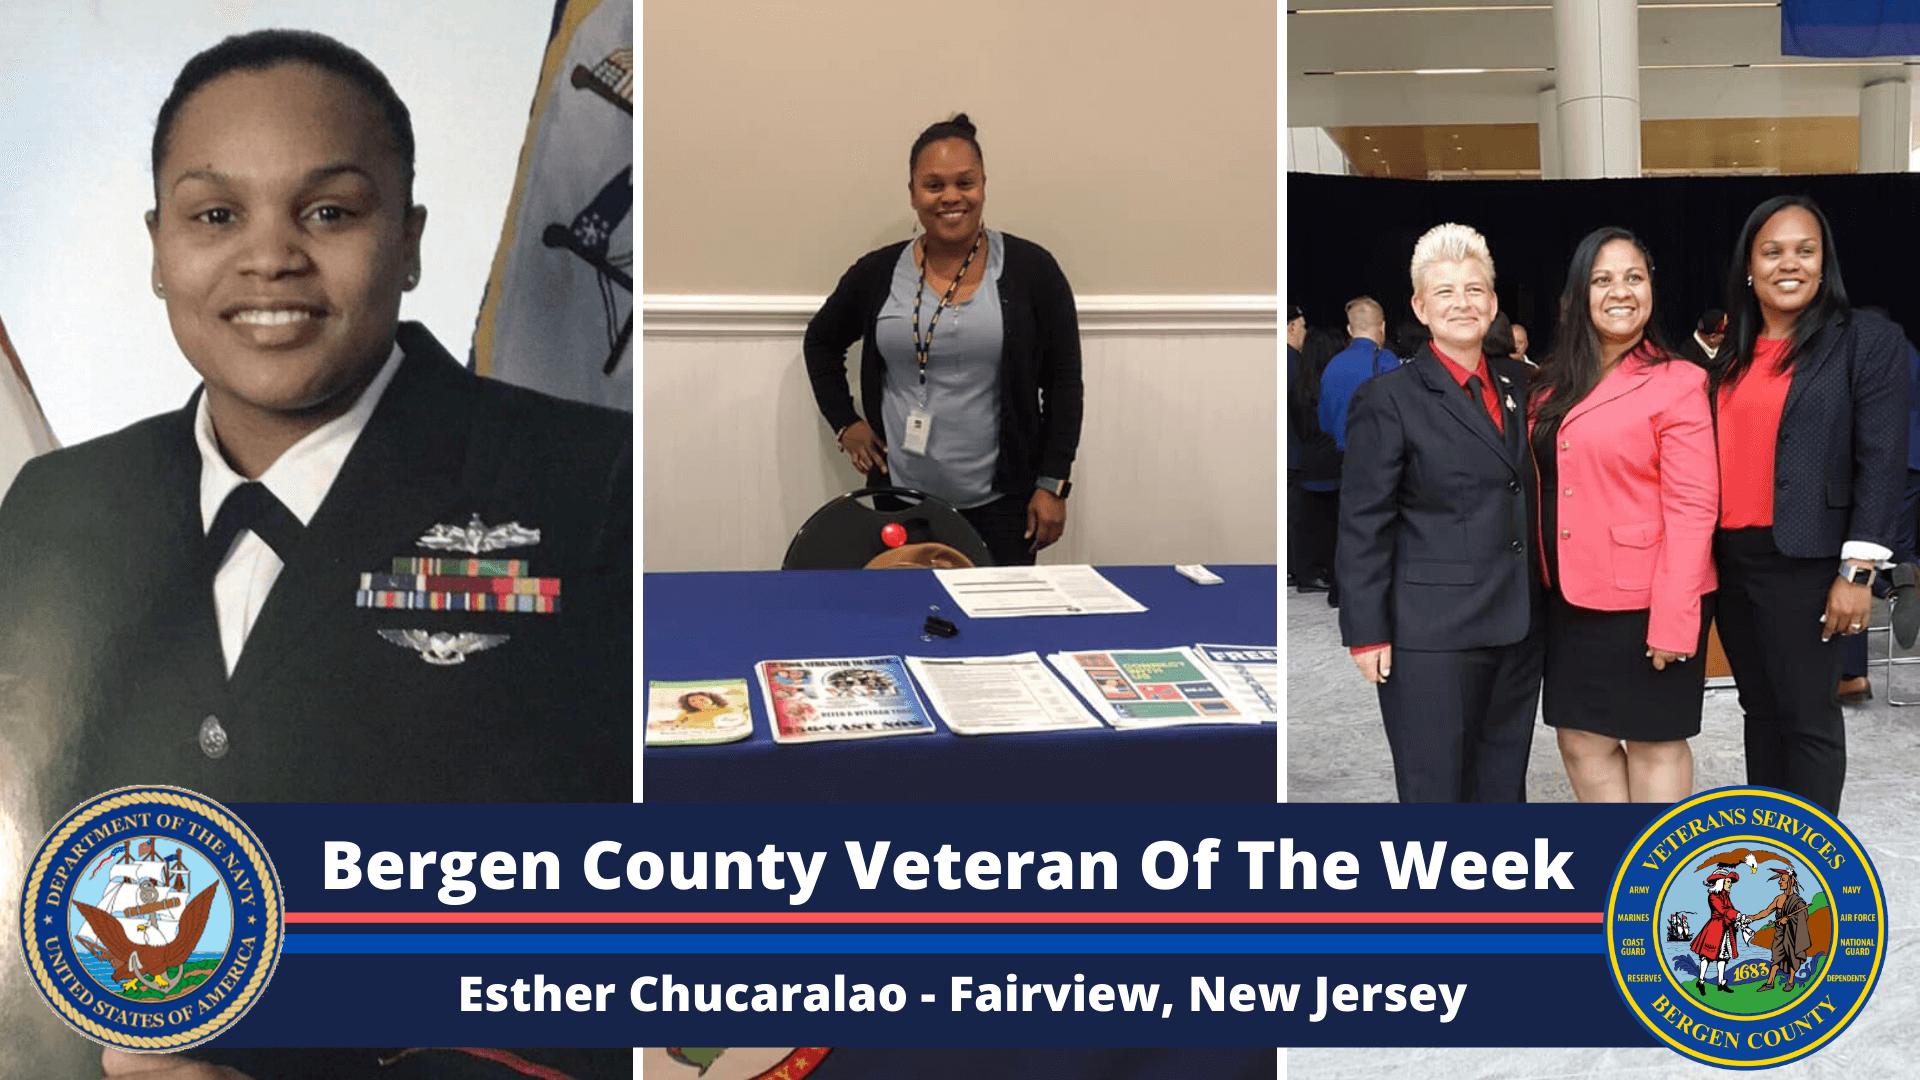 Bergen County Veteran of the Week: Esther Chucaralao